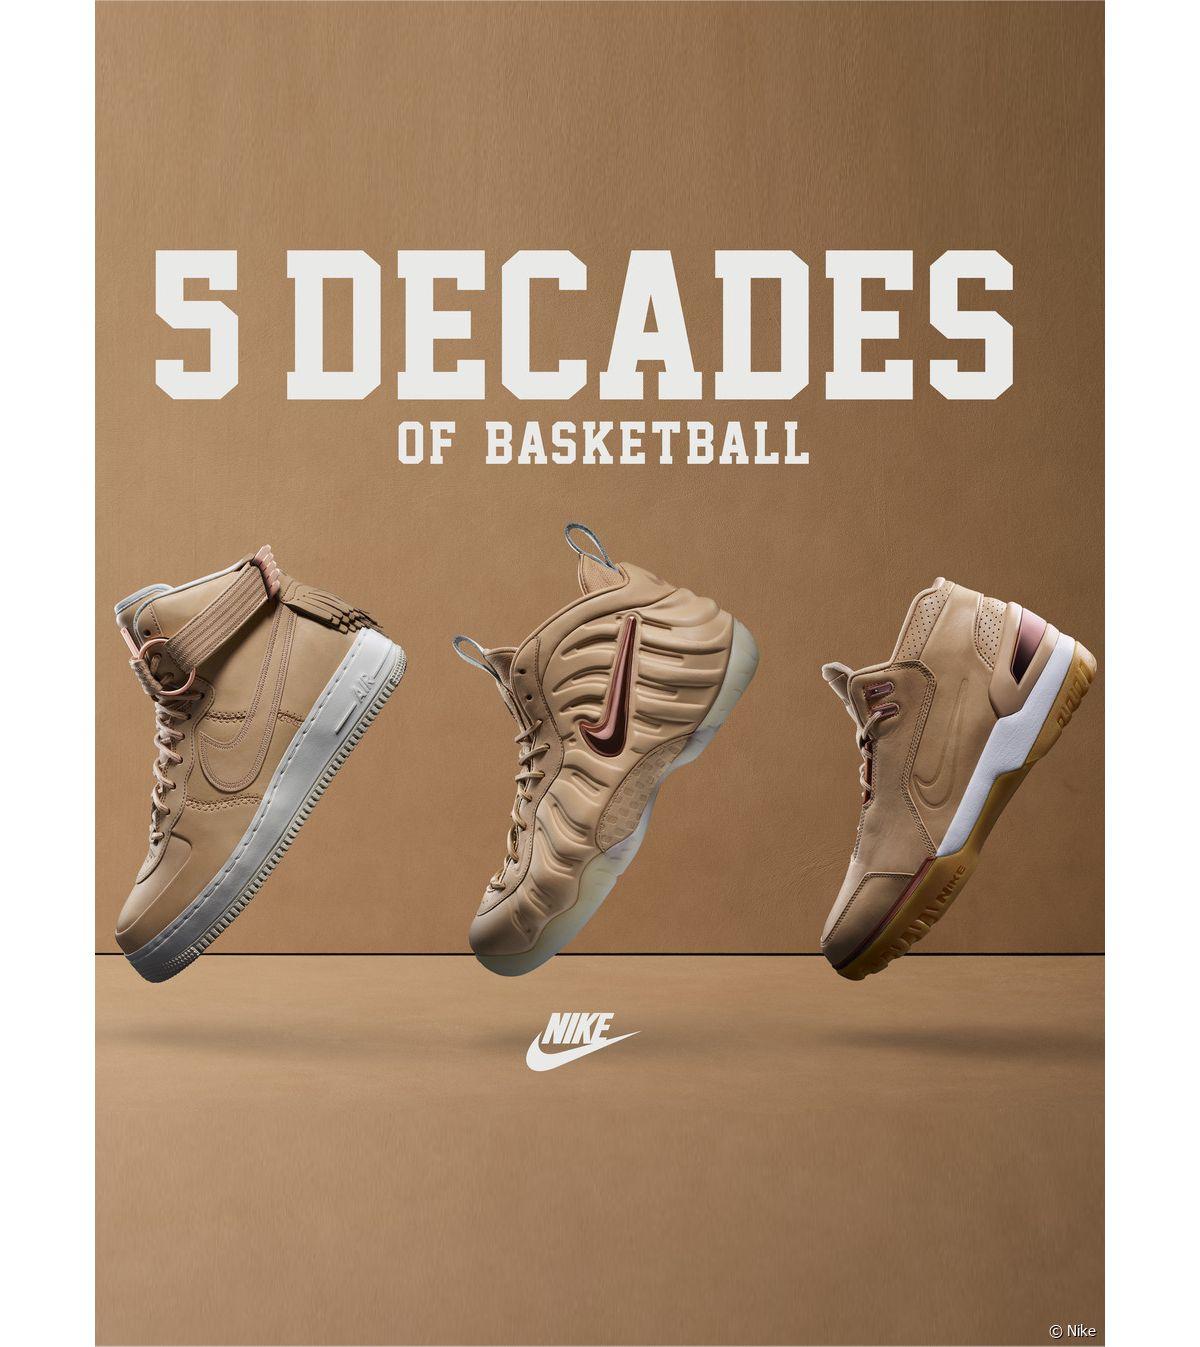 ffe8d207658d Baskets : Nike célèbre 5 décennies de basketball